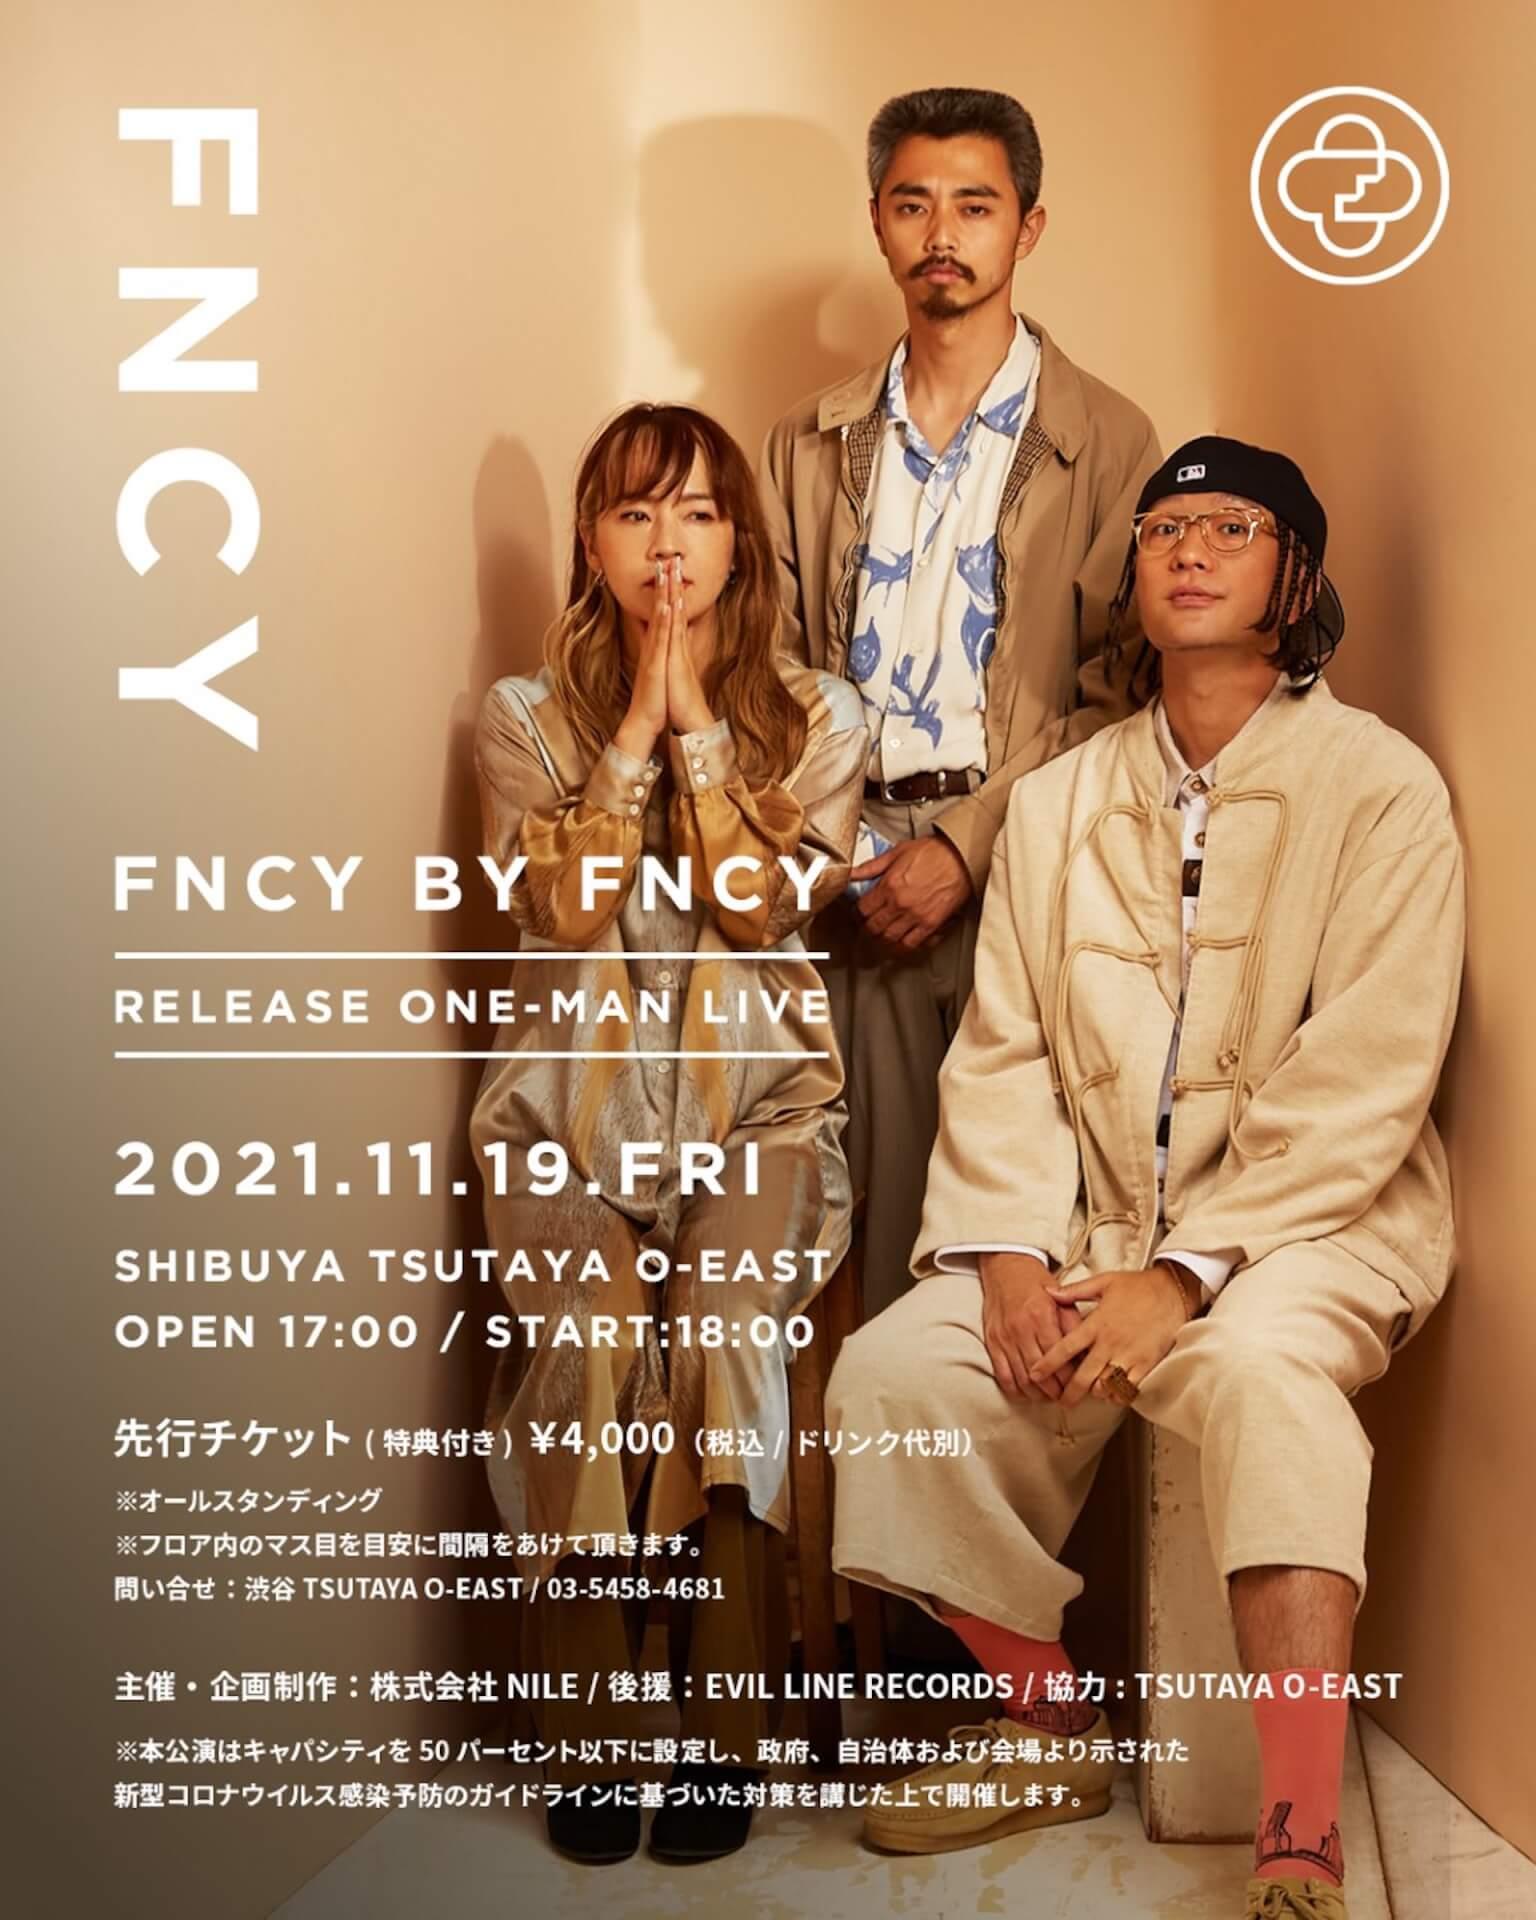 FNCYによる有観客の初ワンマンライブが開催決定!先行予約で特典プレゼントも music211008_fncy_live_main